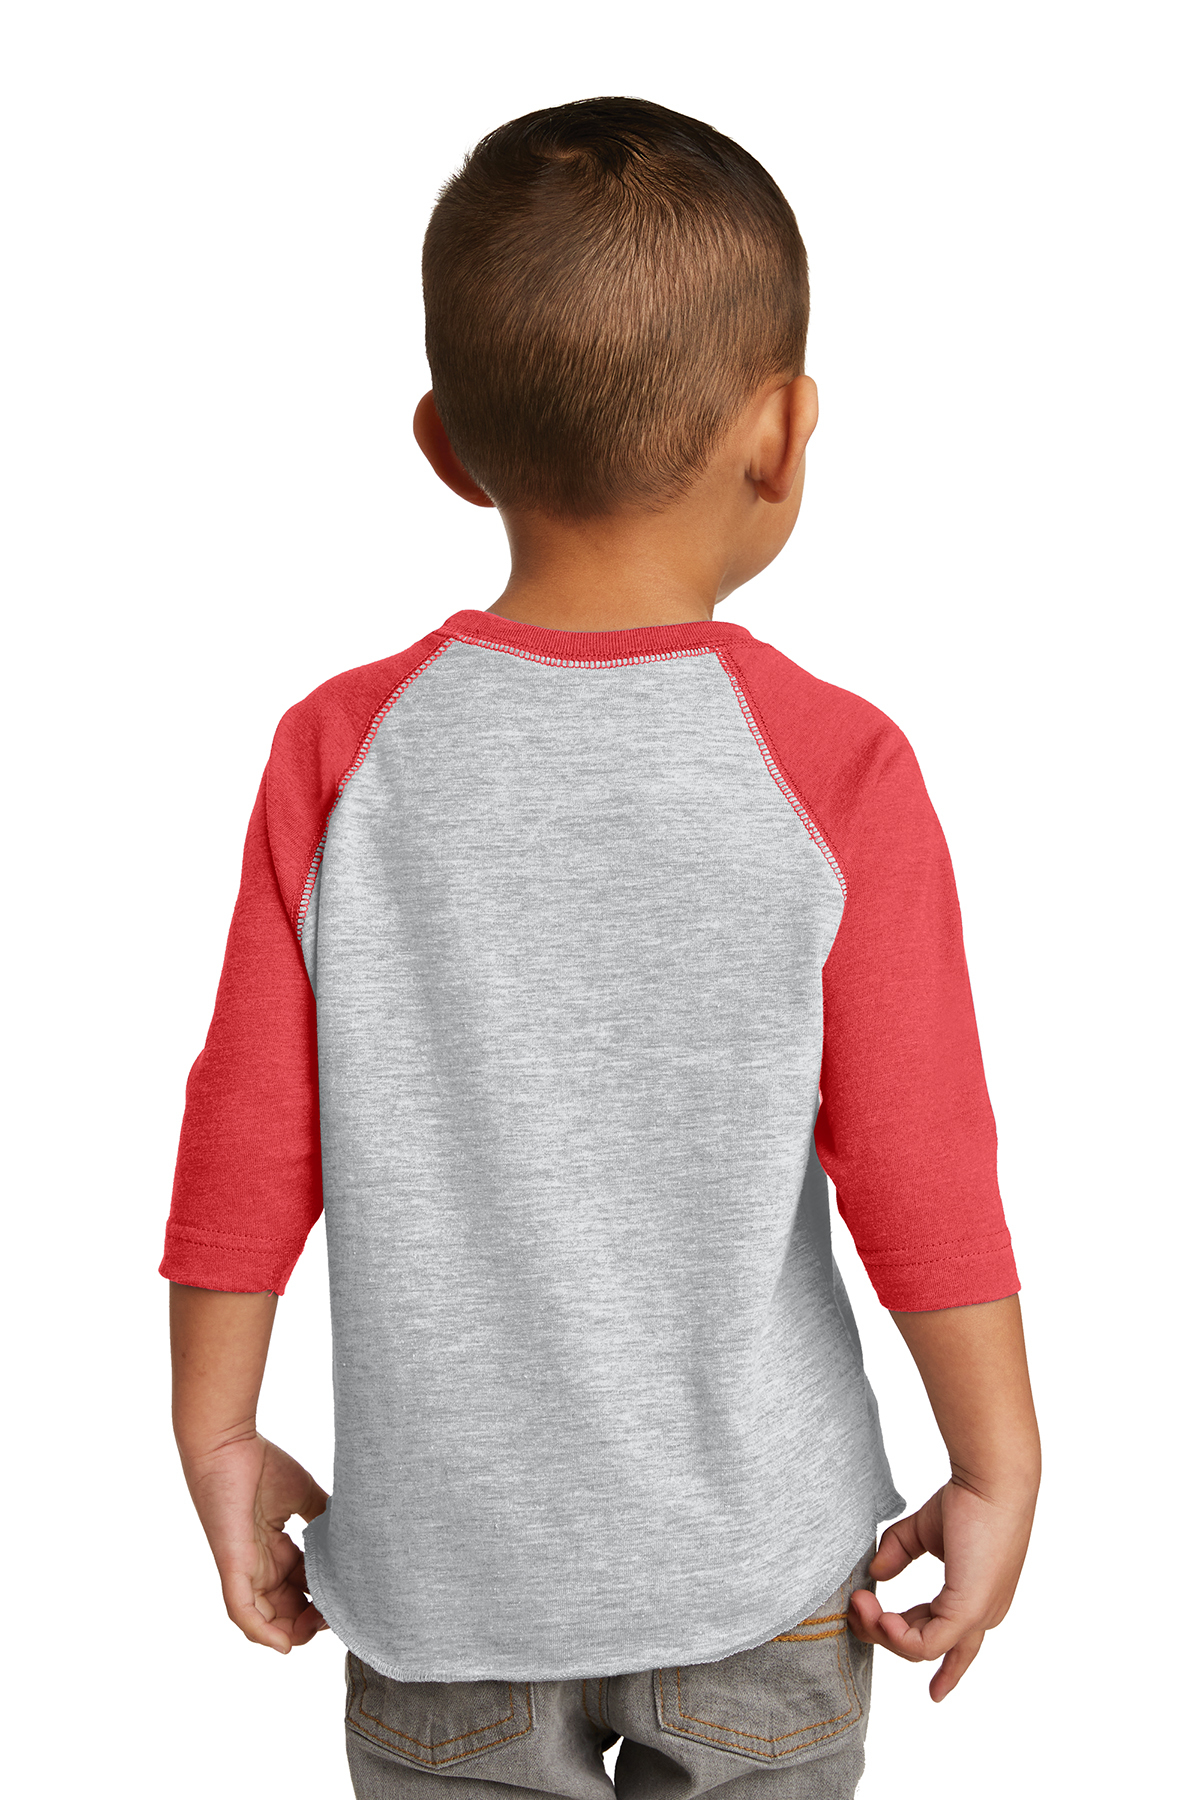 5a703baed Rabbit Skins™ Toddler Baseball Fine Jersey Tee   Infant & Toddler ...